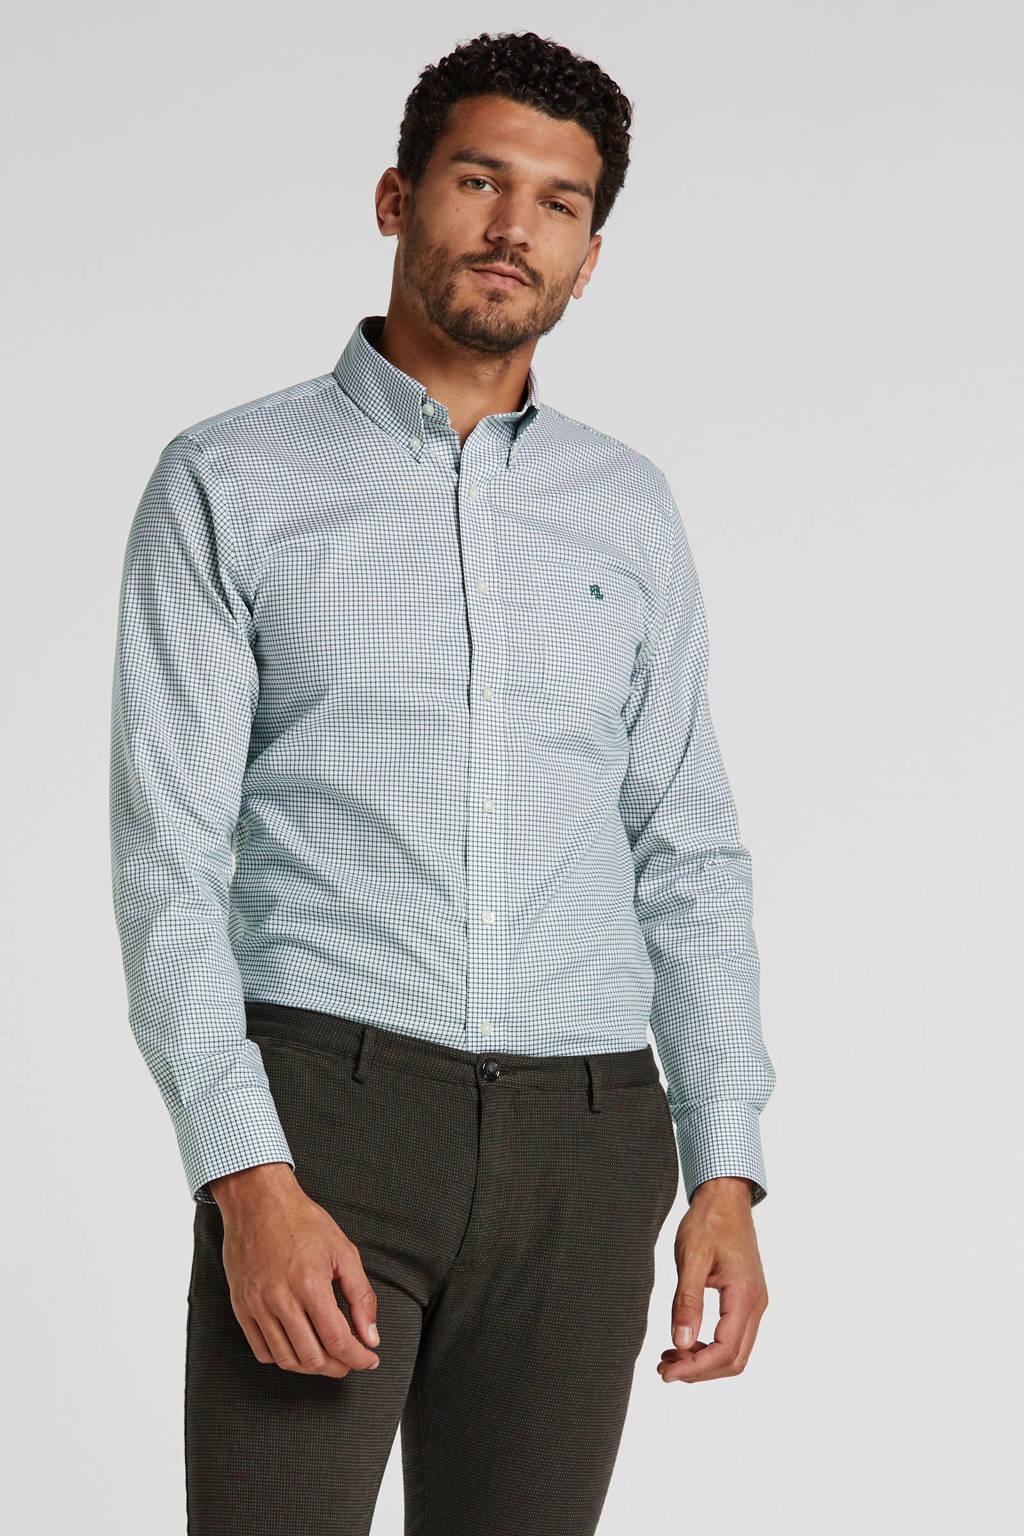 POLO Ralph Lauren geruit regular fit overhemd groen/wit, Groen/wit